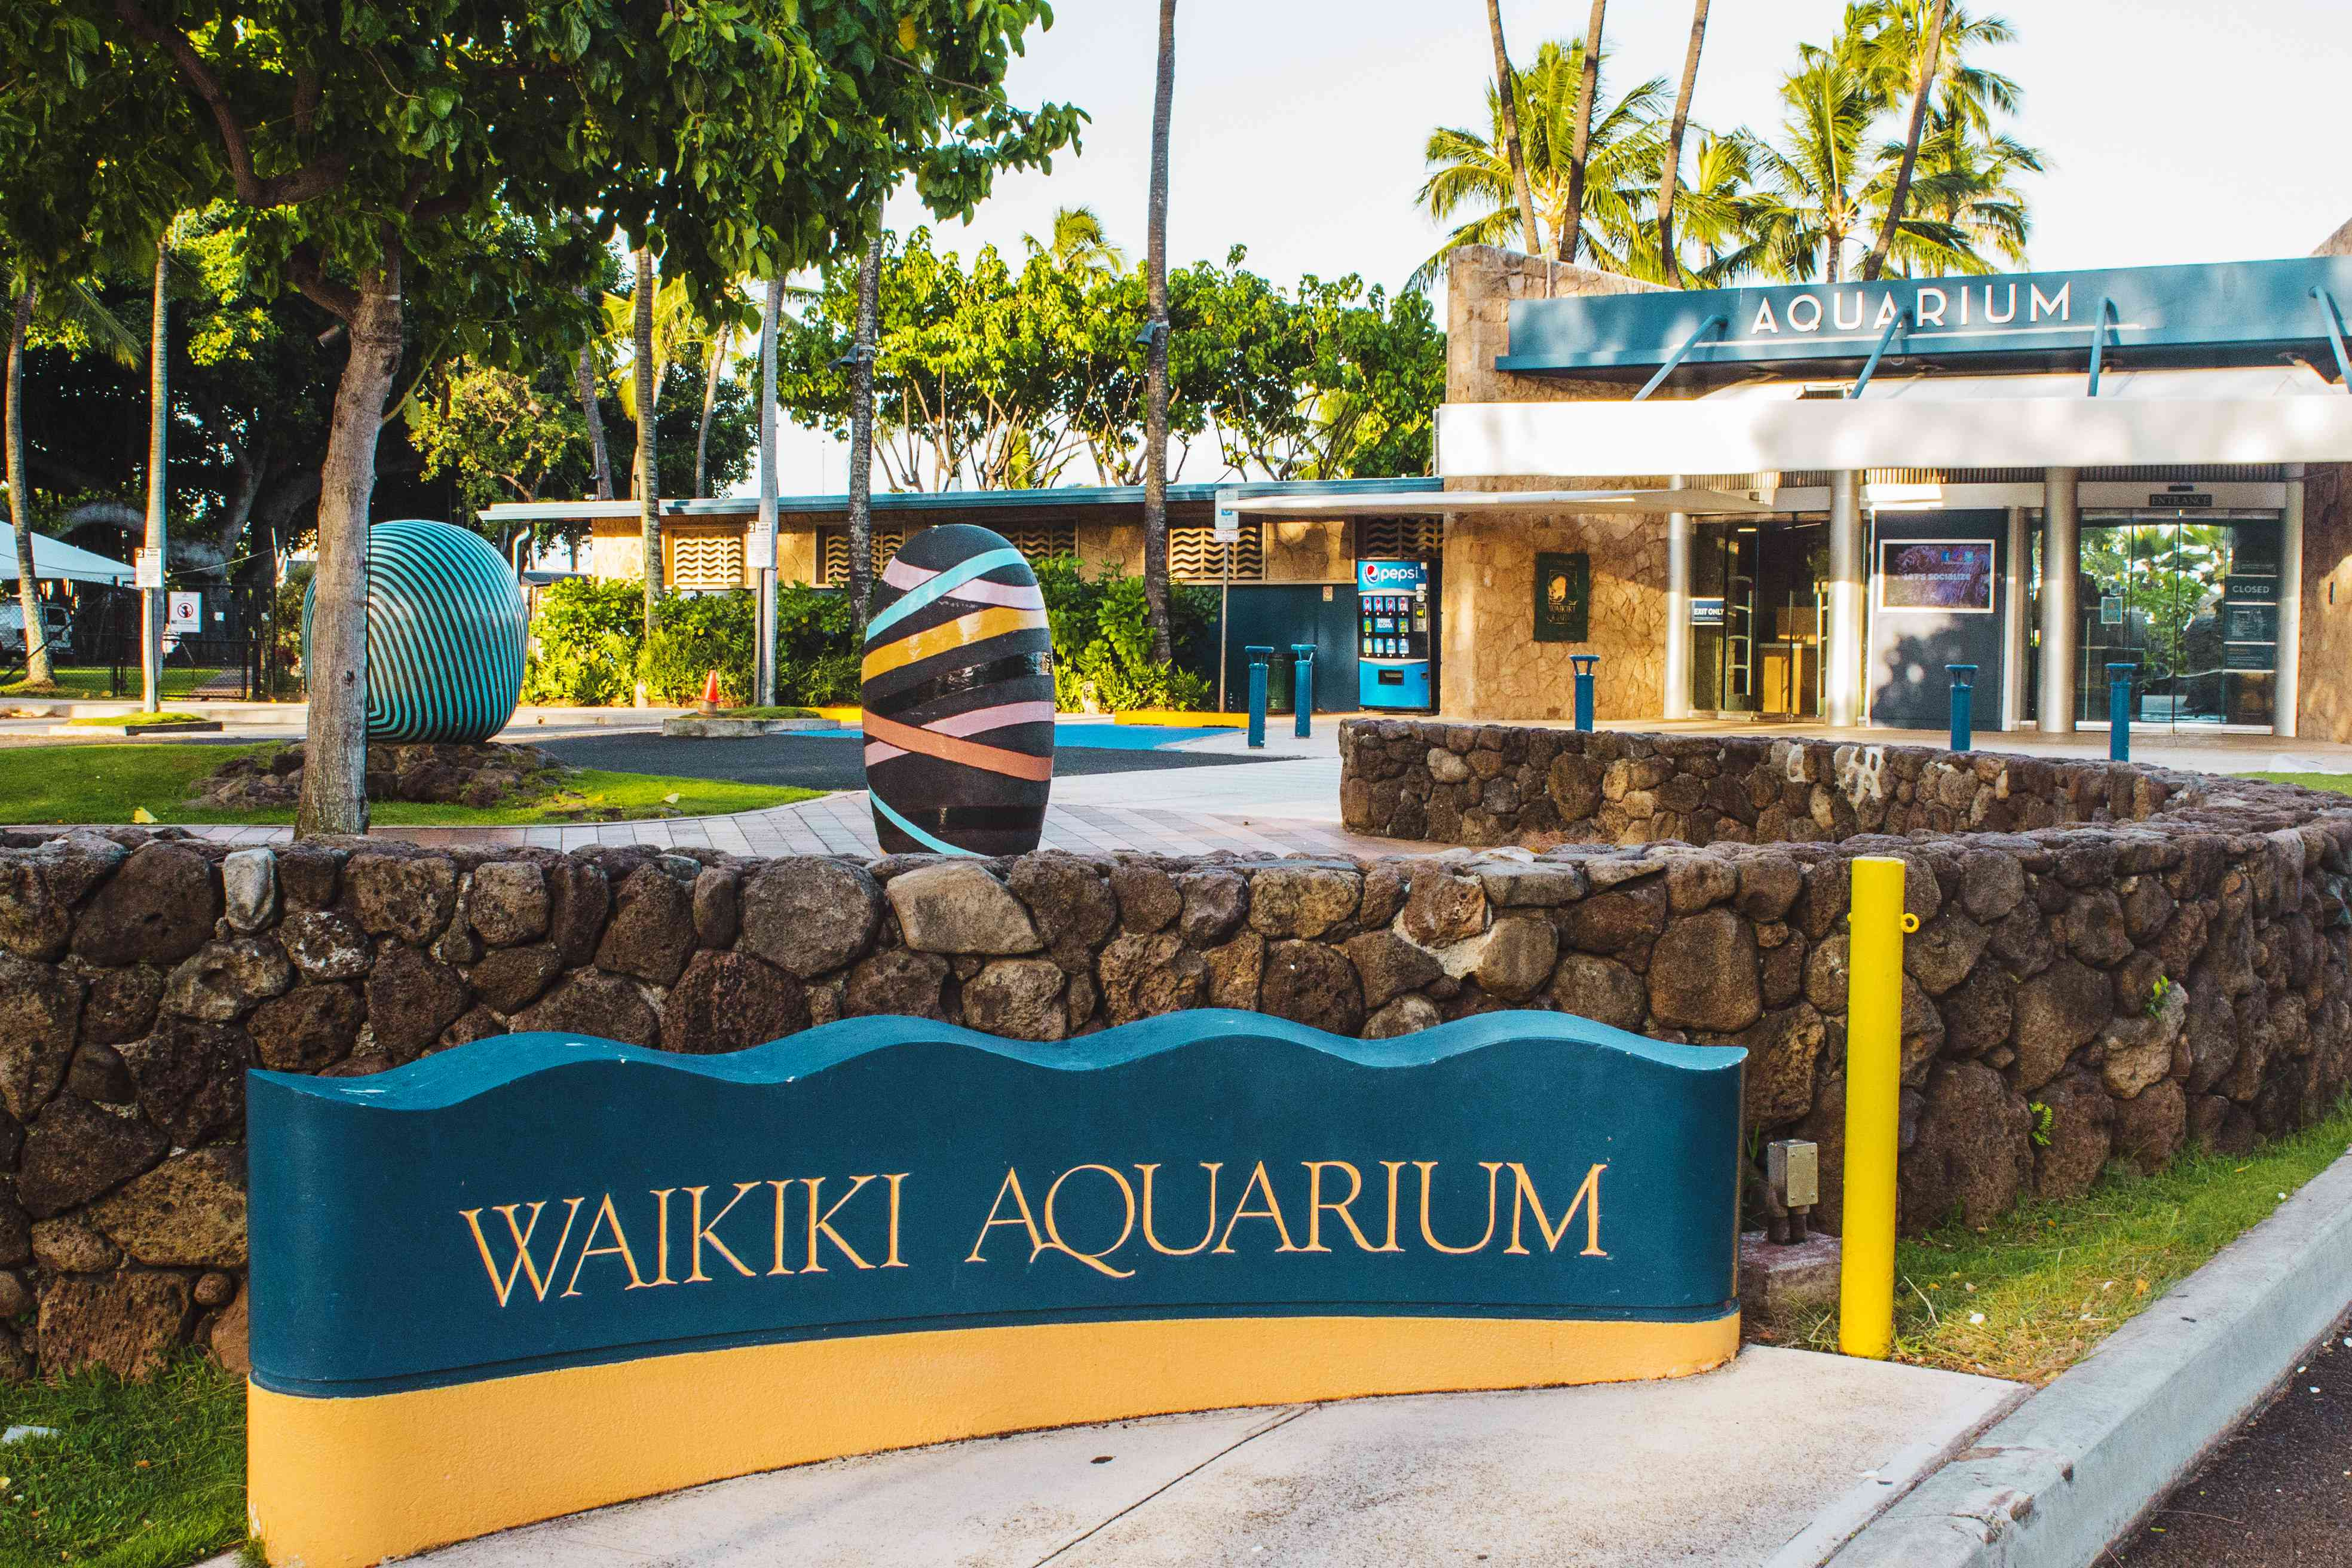 Sign and entrance to the Waikiki Aquarium